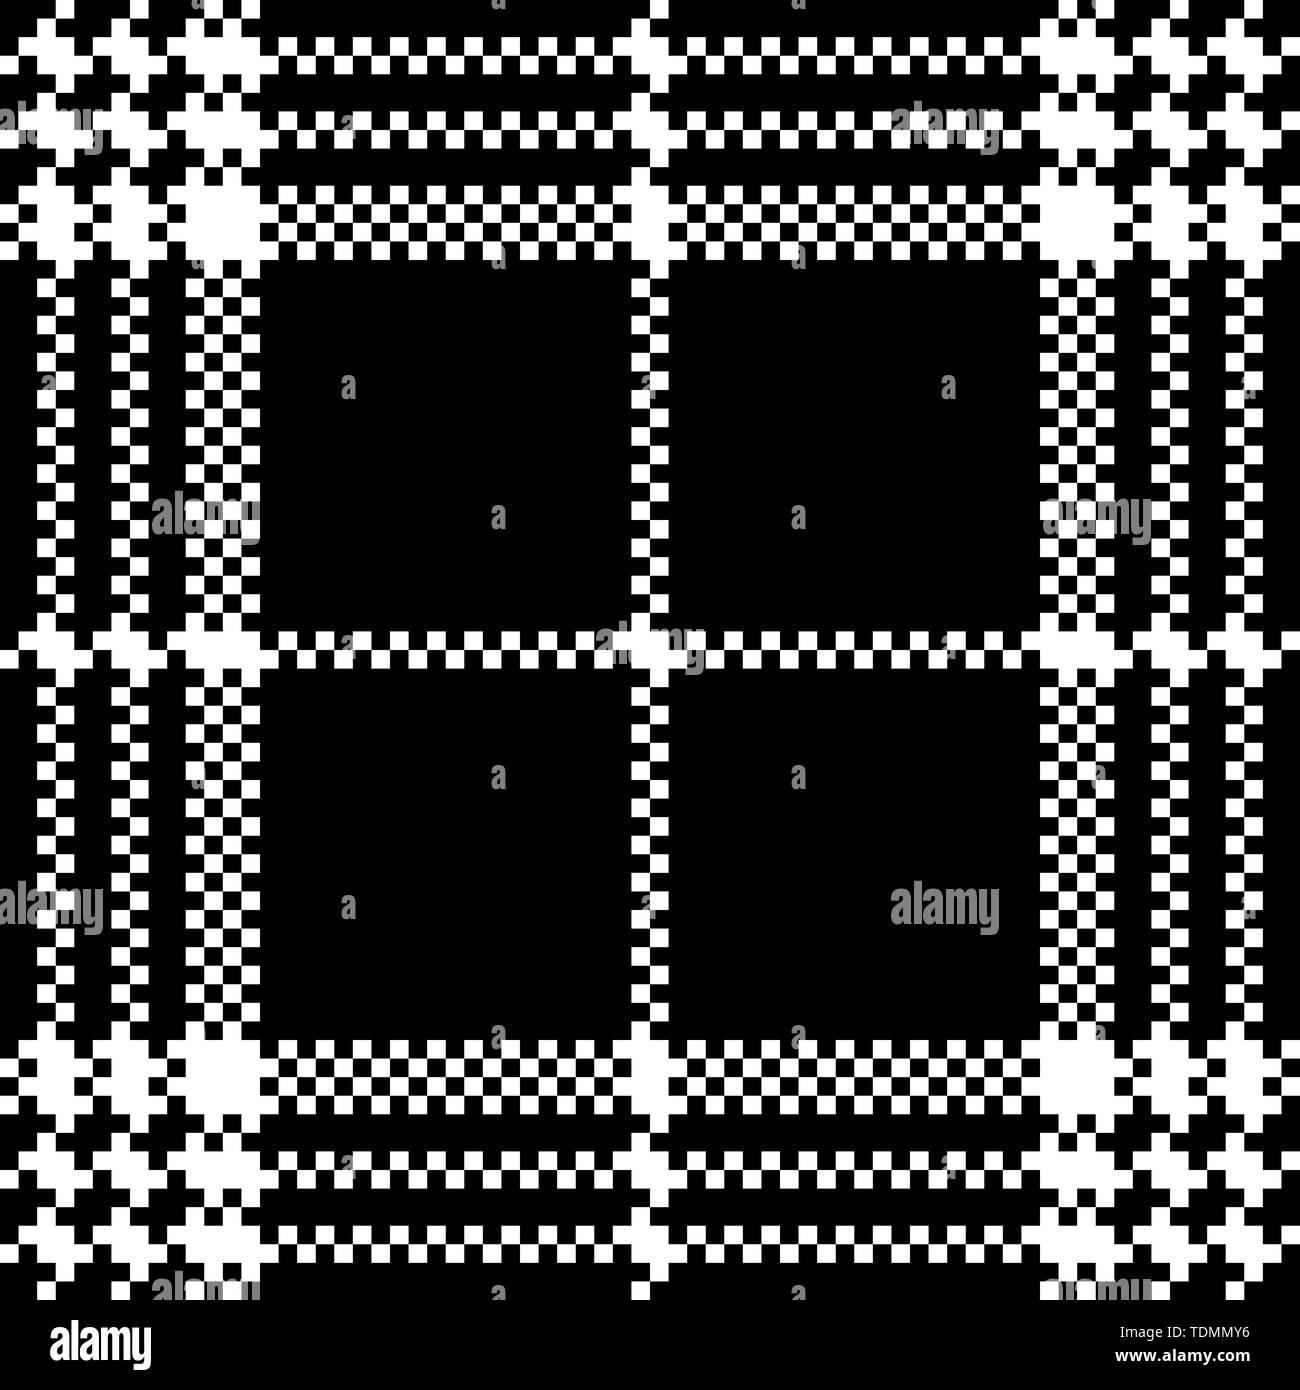 Simple dark fabric check black white seamless pattern. Vector illustration. - Stock Vector